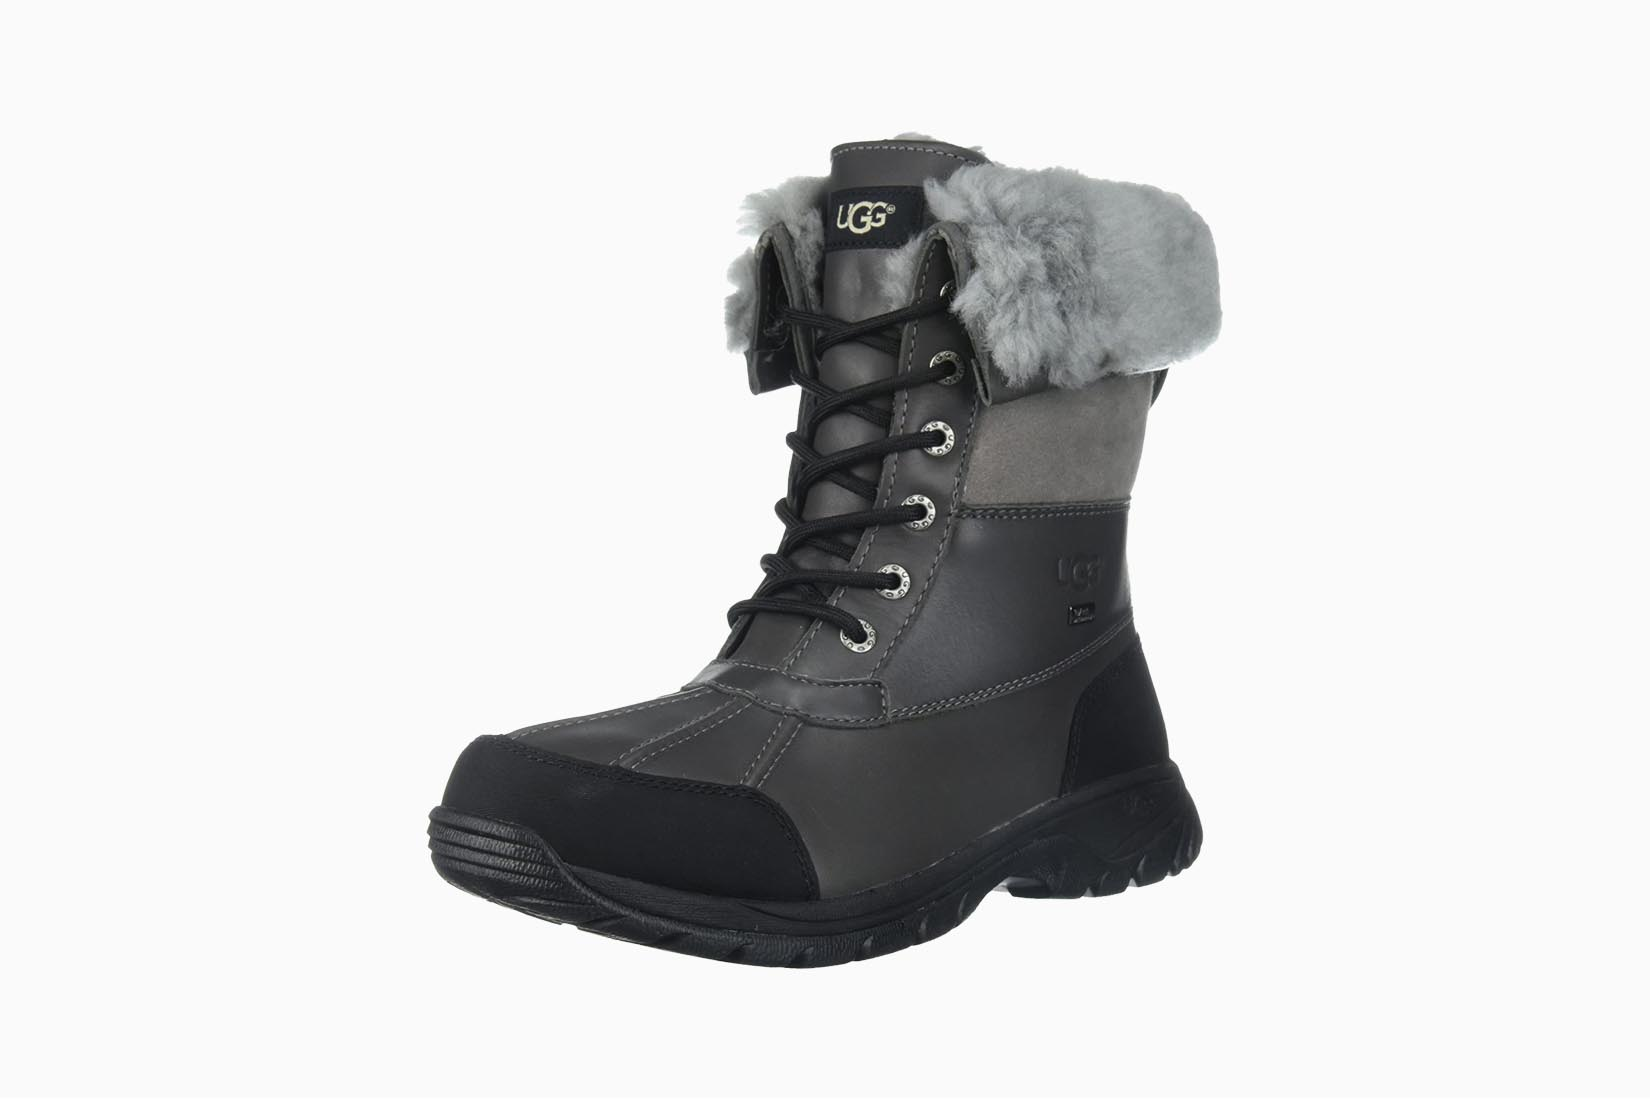 best boots men UGG butte snow boot review Luxe Digital